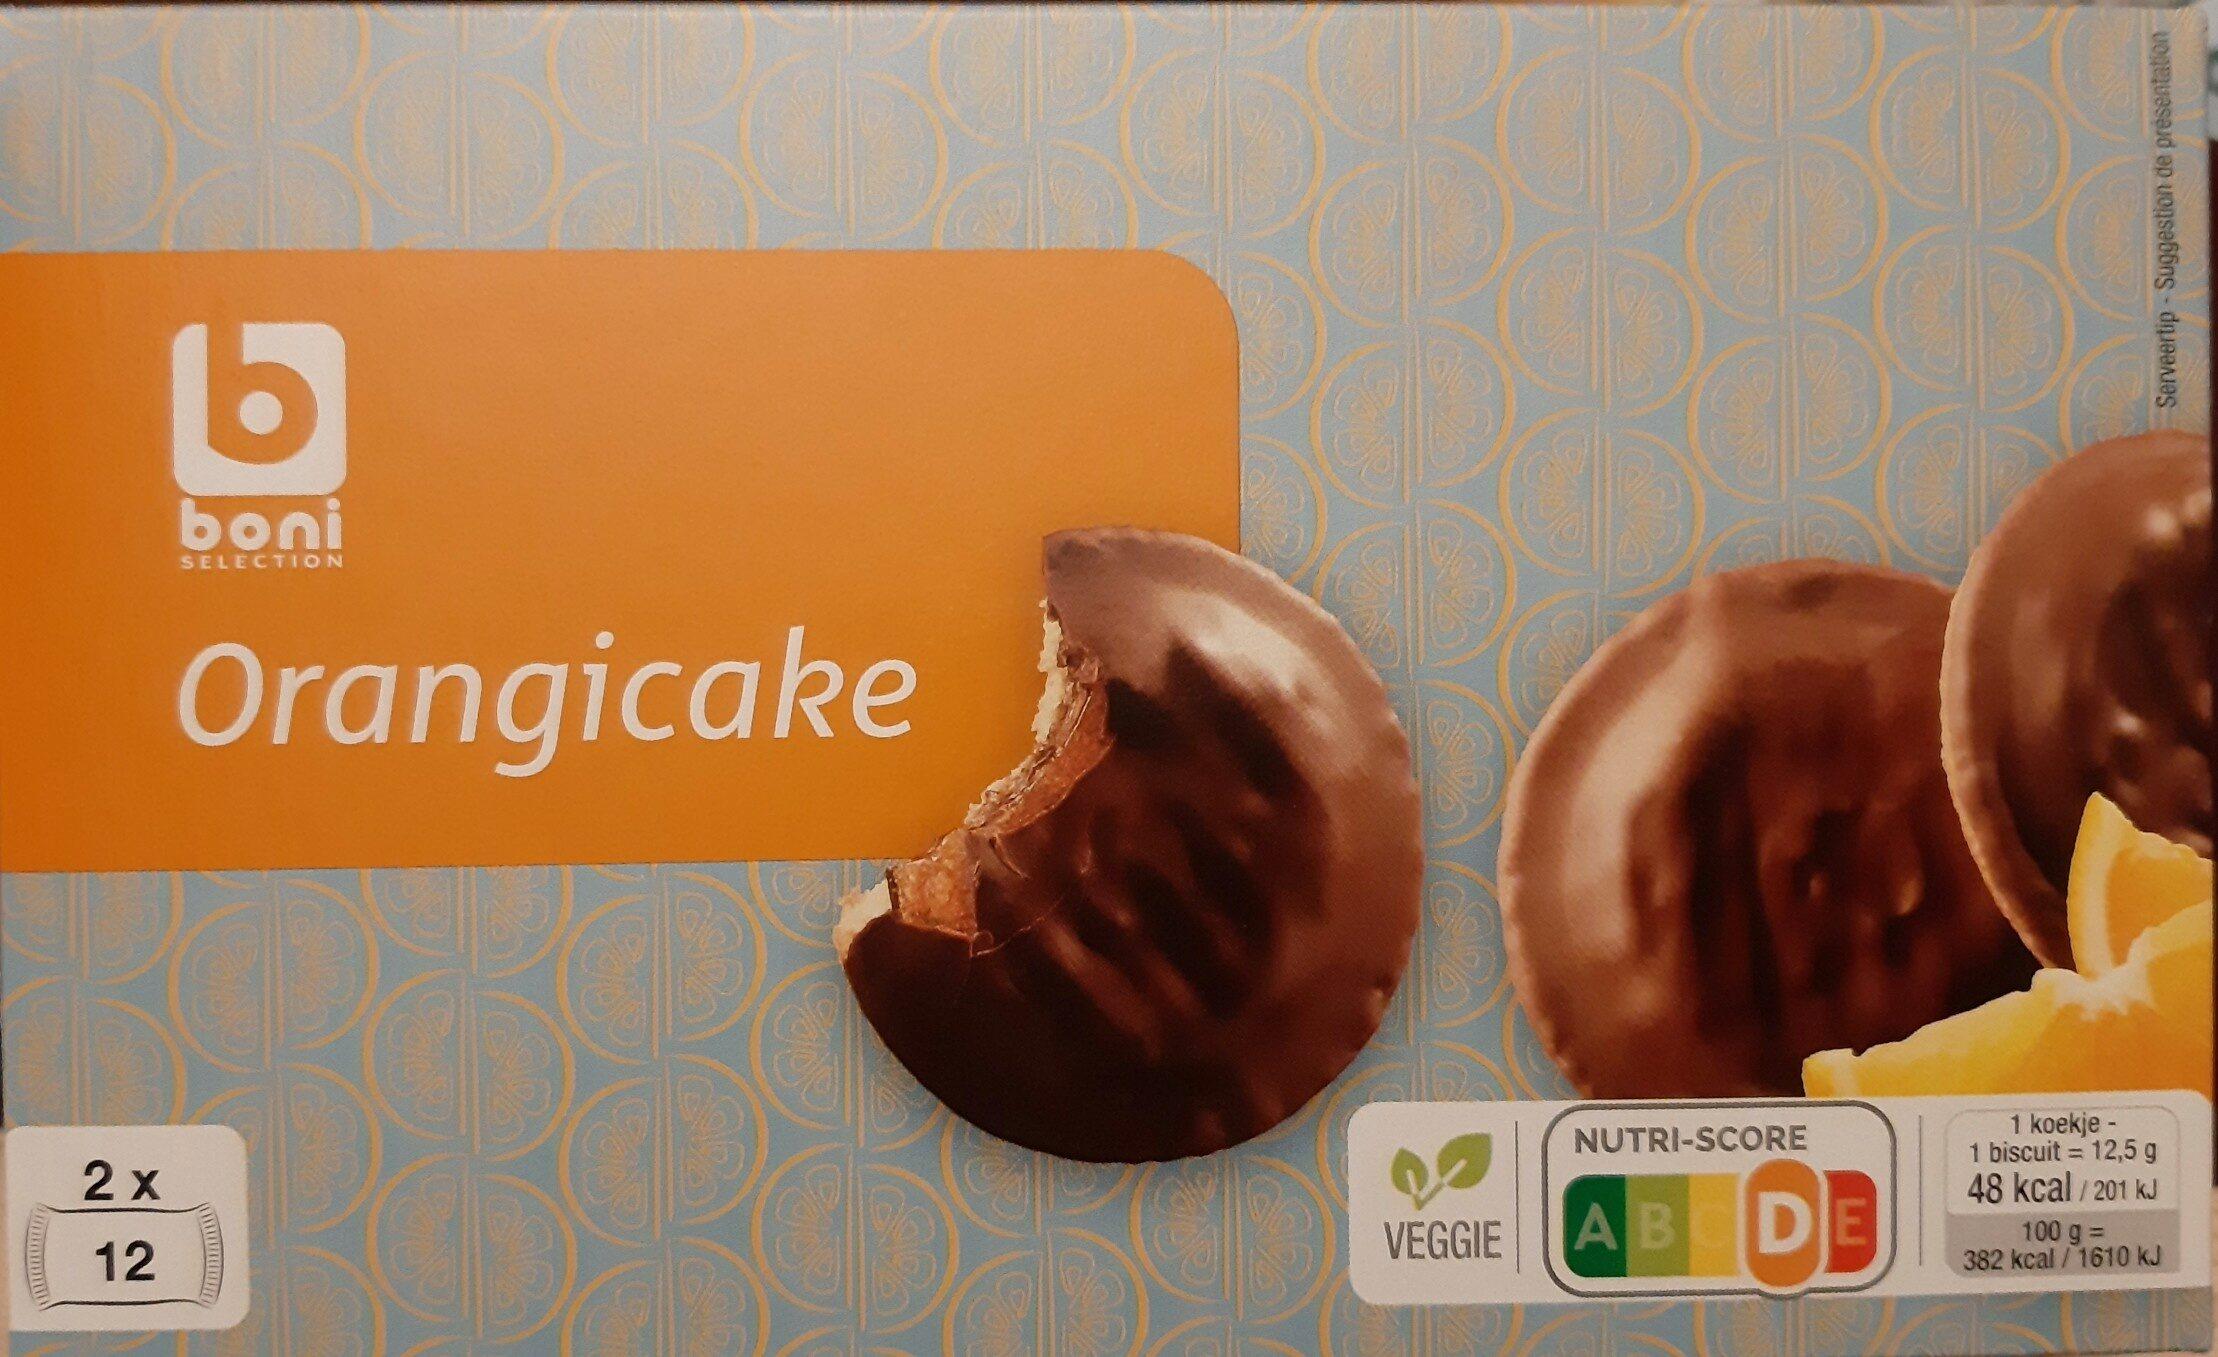 Orangicake - Product - en